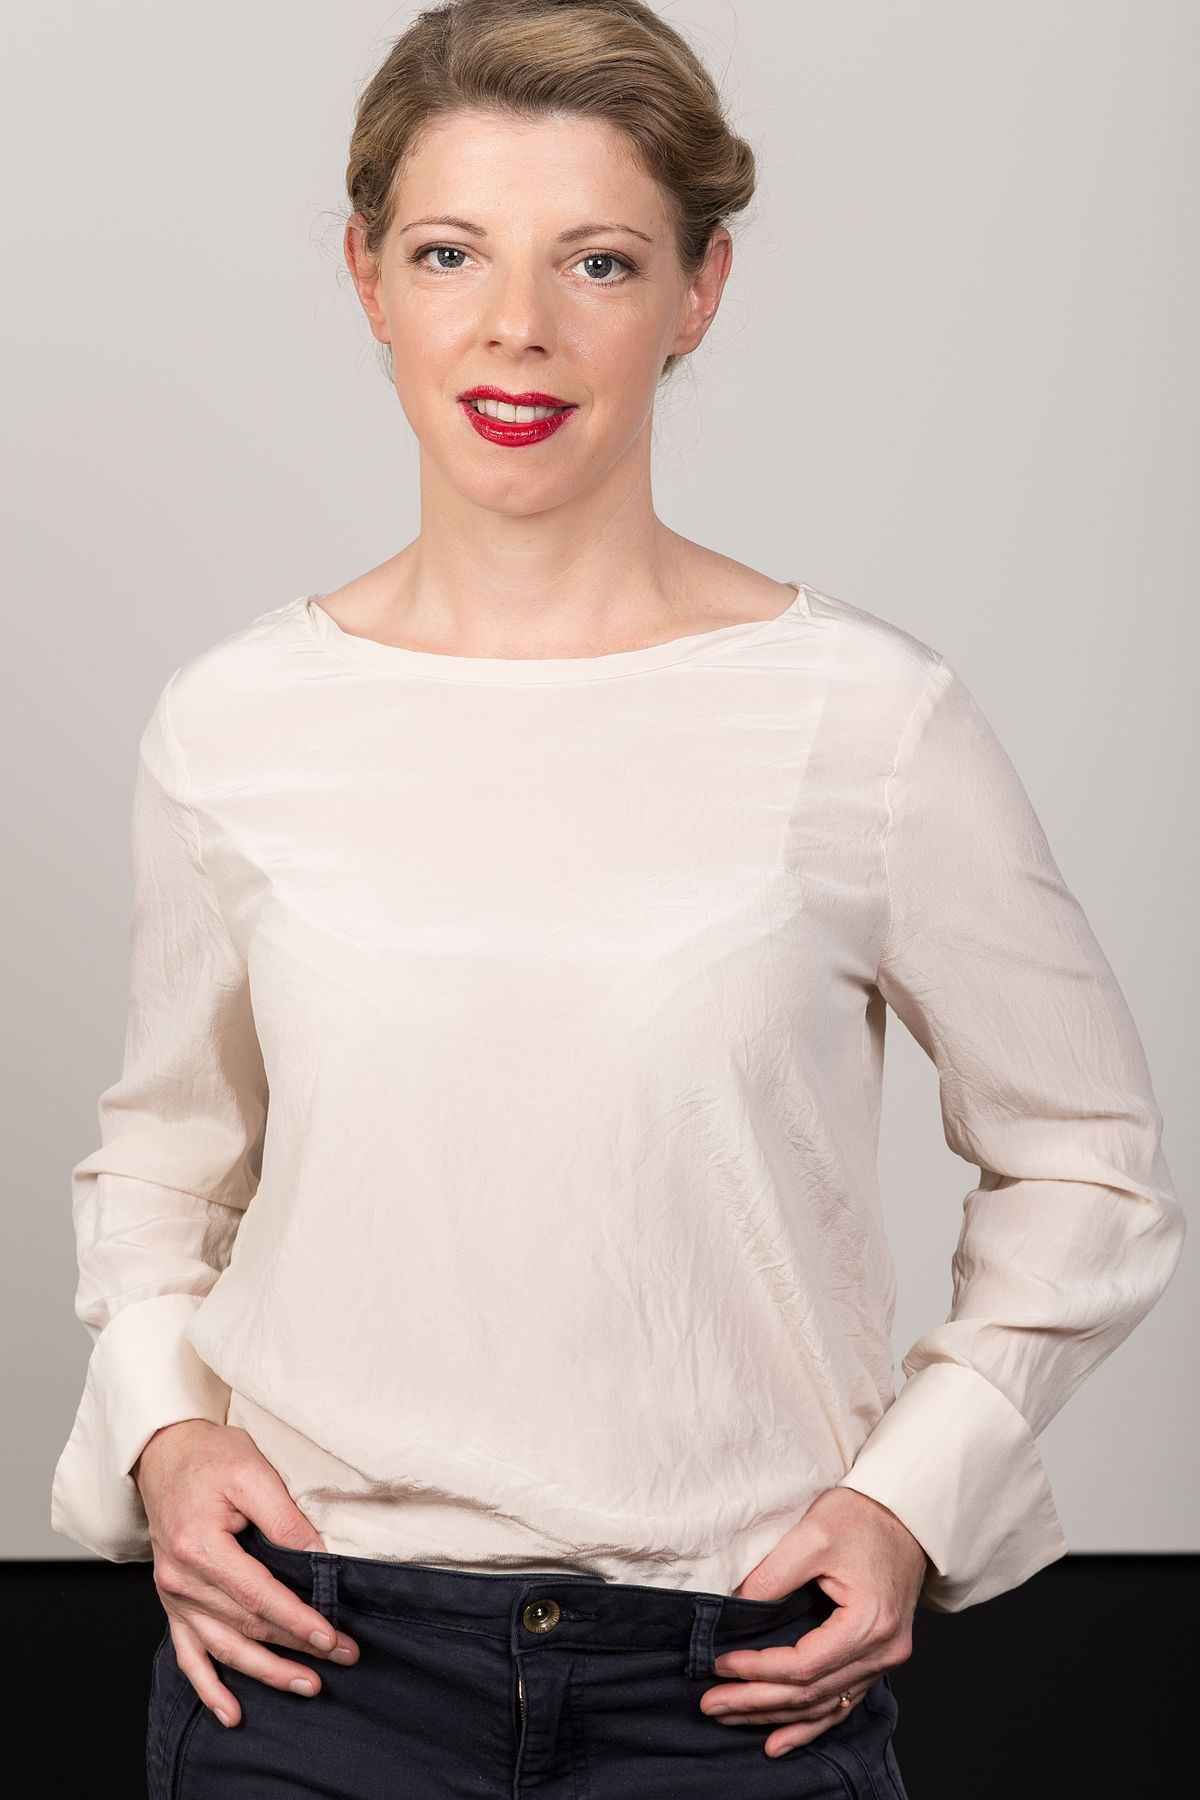 Karin Lischka - Wikipedia